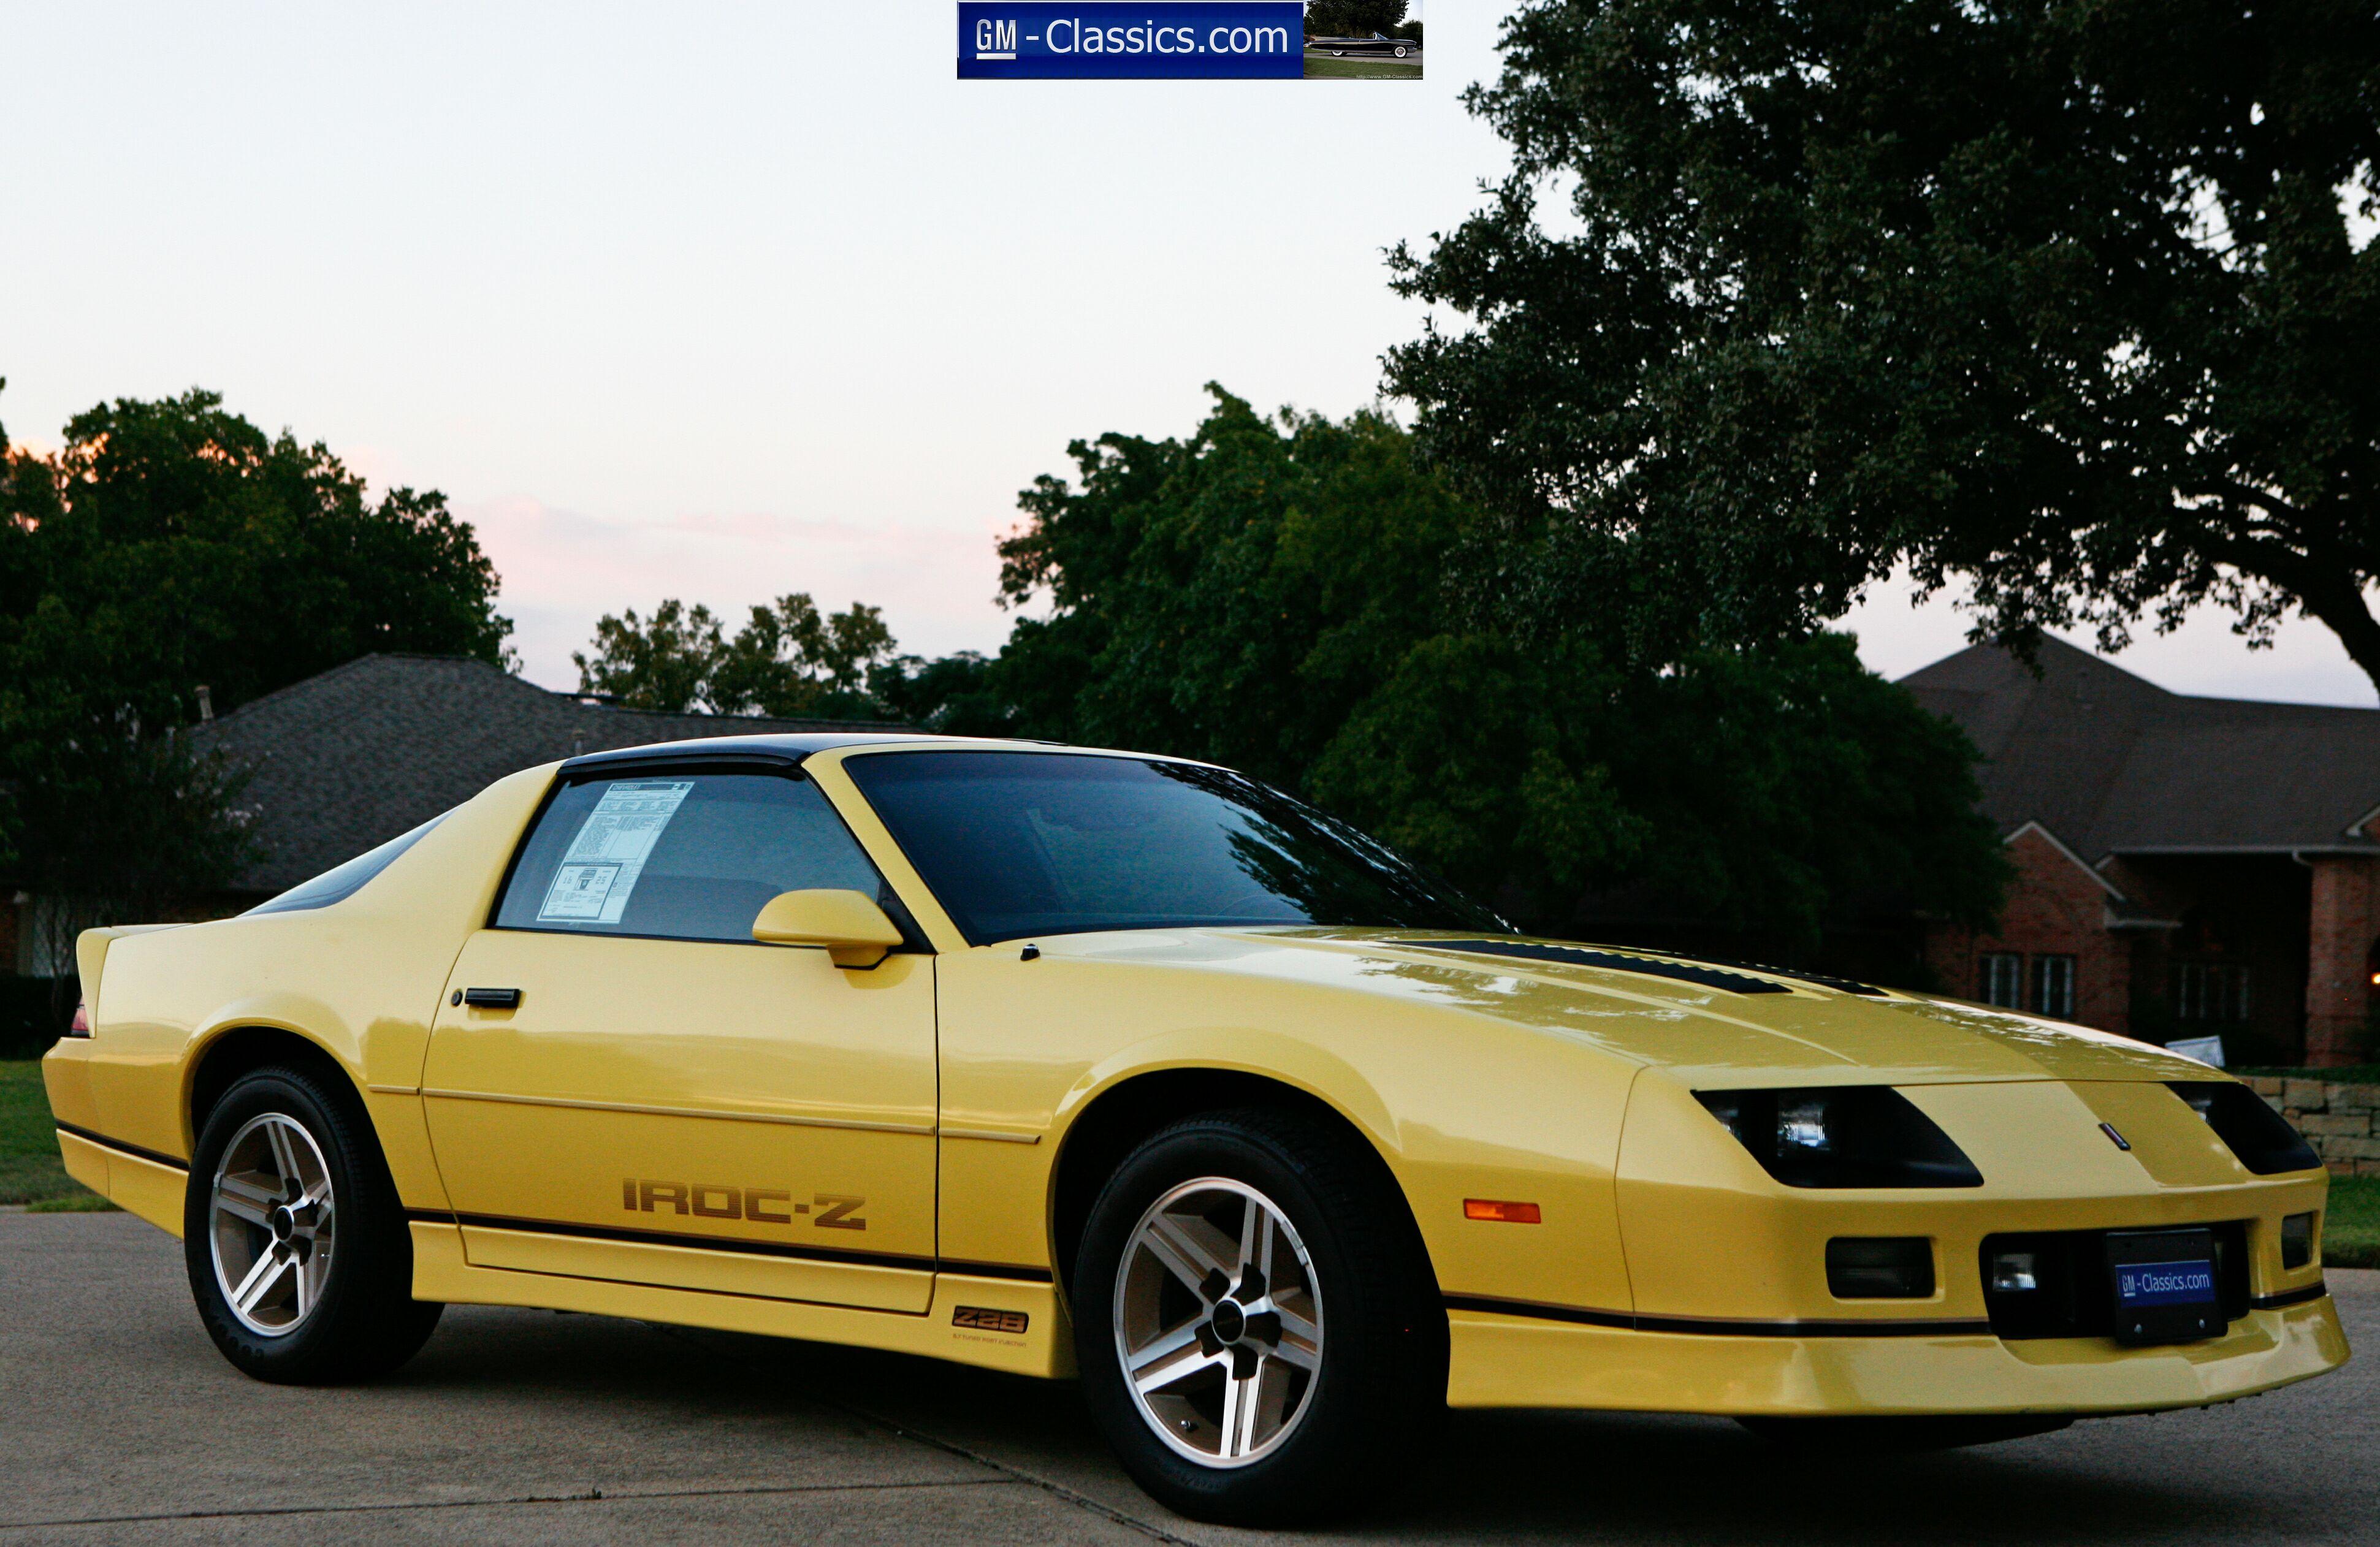 1987 Chevrolet Camaro Iroc Ebay